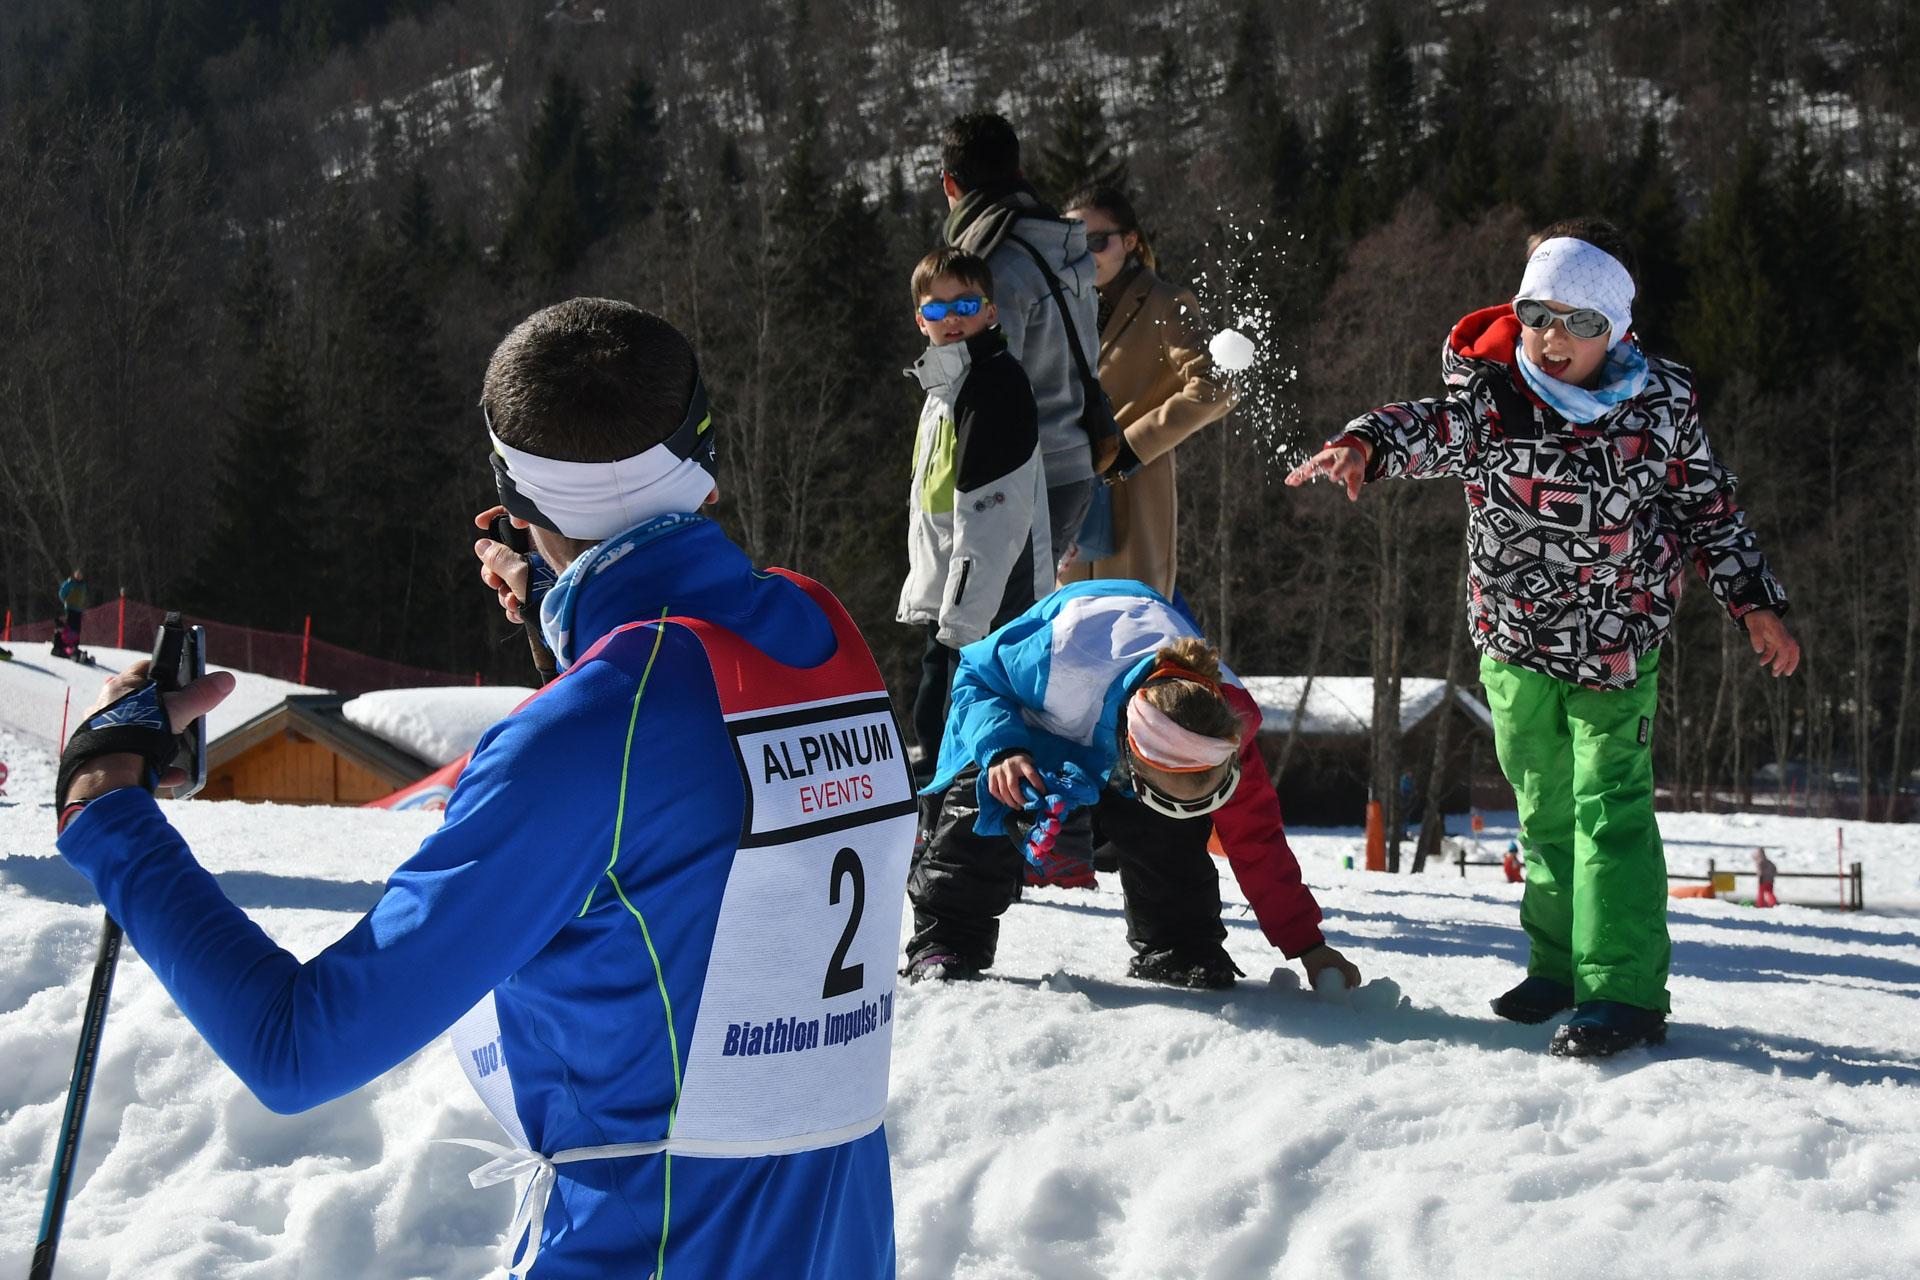 Alpinum-Biathlon-Impulse-Tour-2019©JulieRuly_187